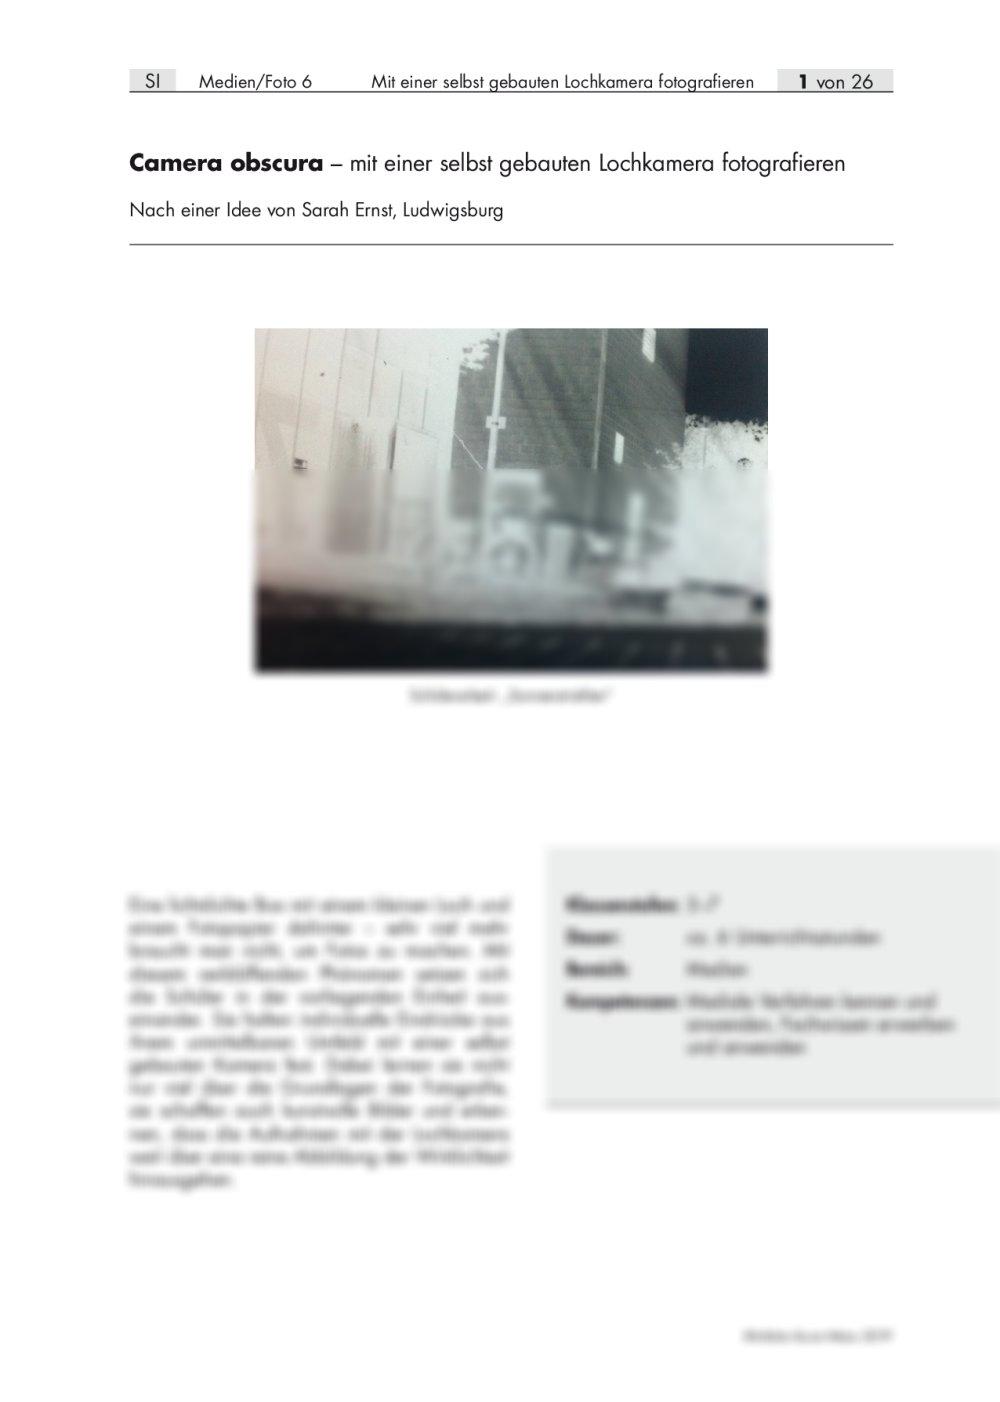 Mit selbst gebauter Lochkamera fotografieren   RAAbits Online